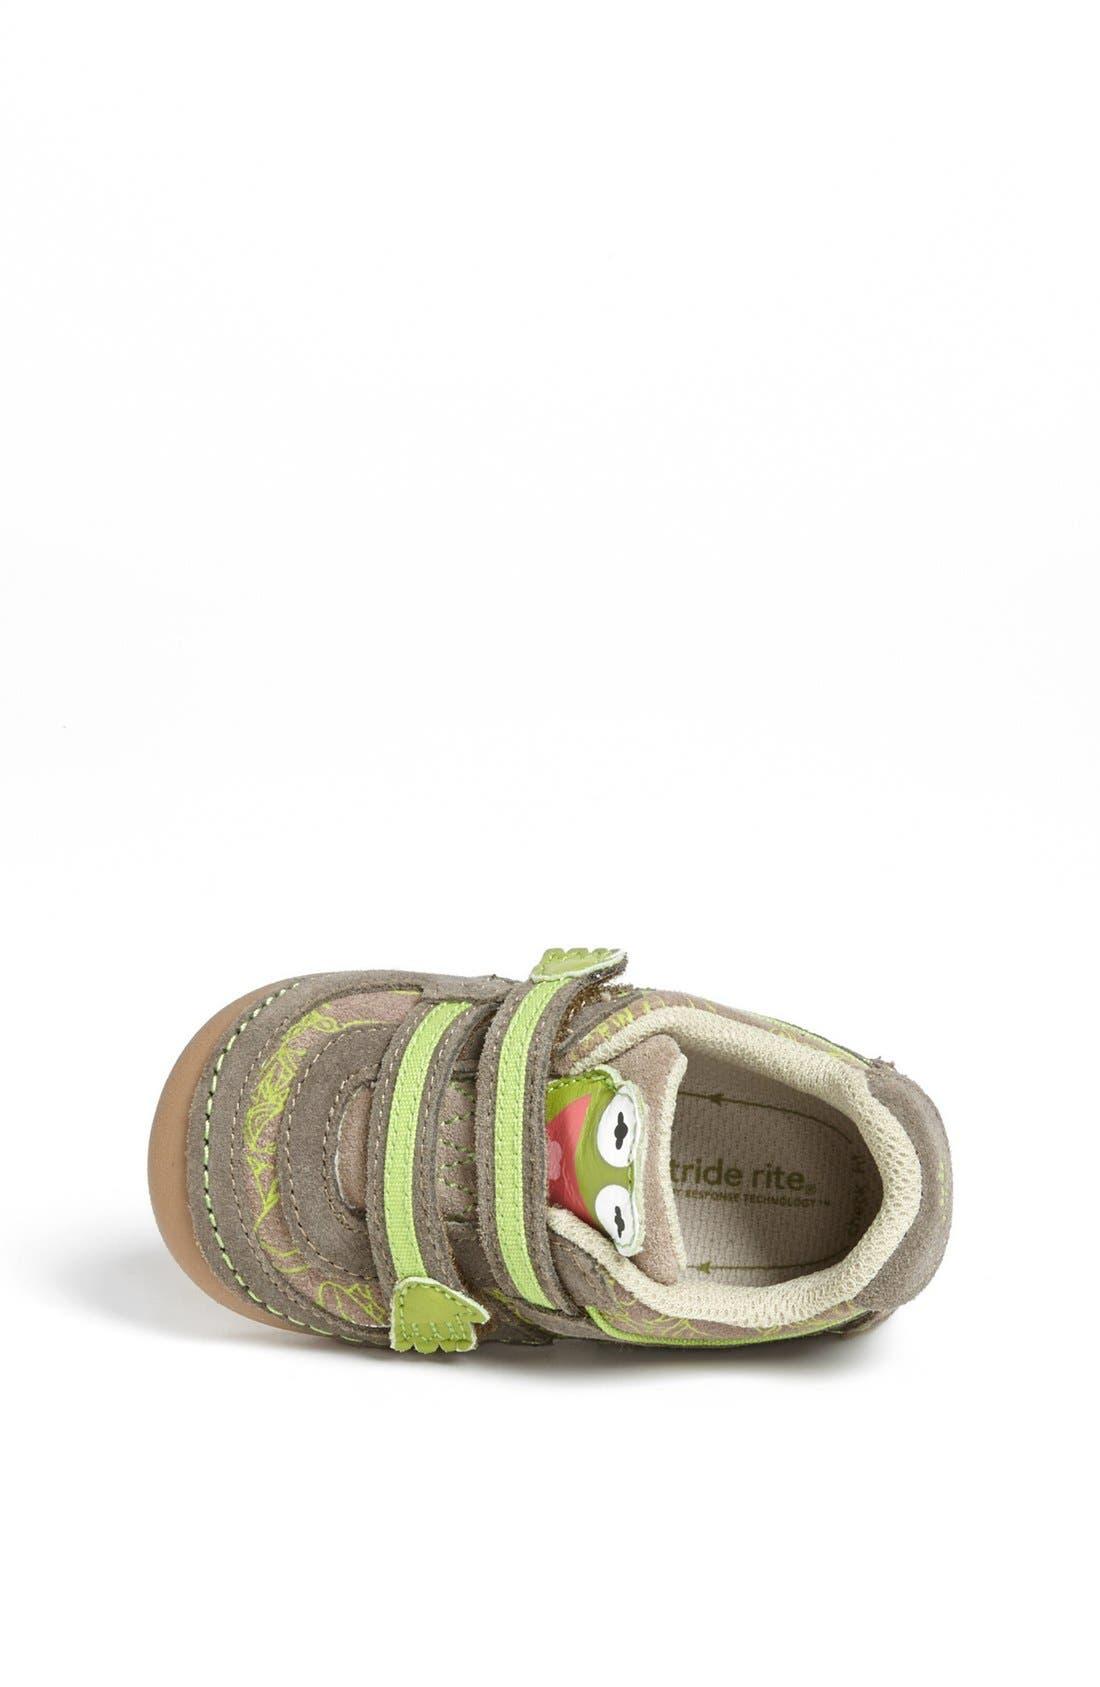 Alternate Image 3  - Stride Rite 'Kermit' Sneaker (Baby & Walker)